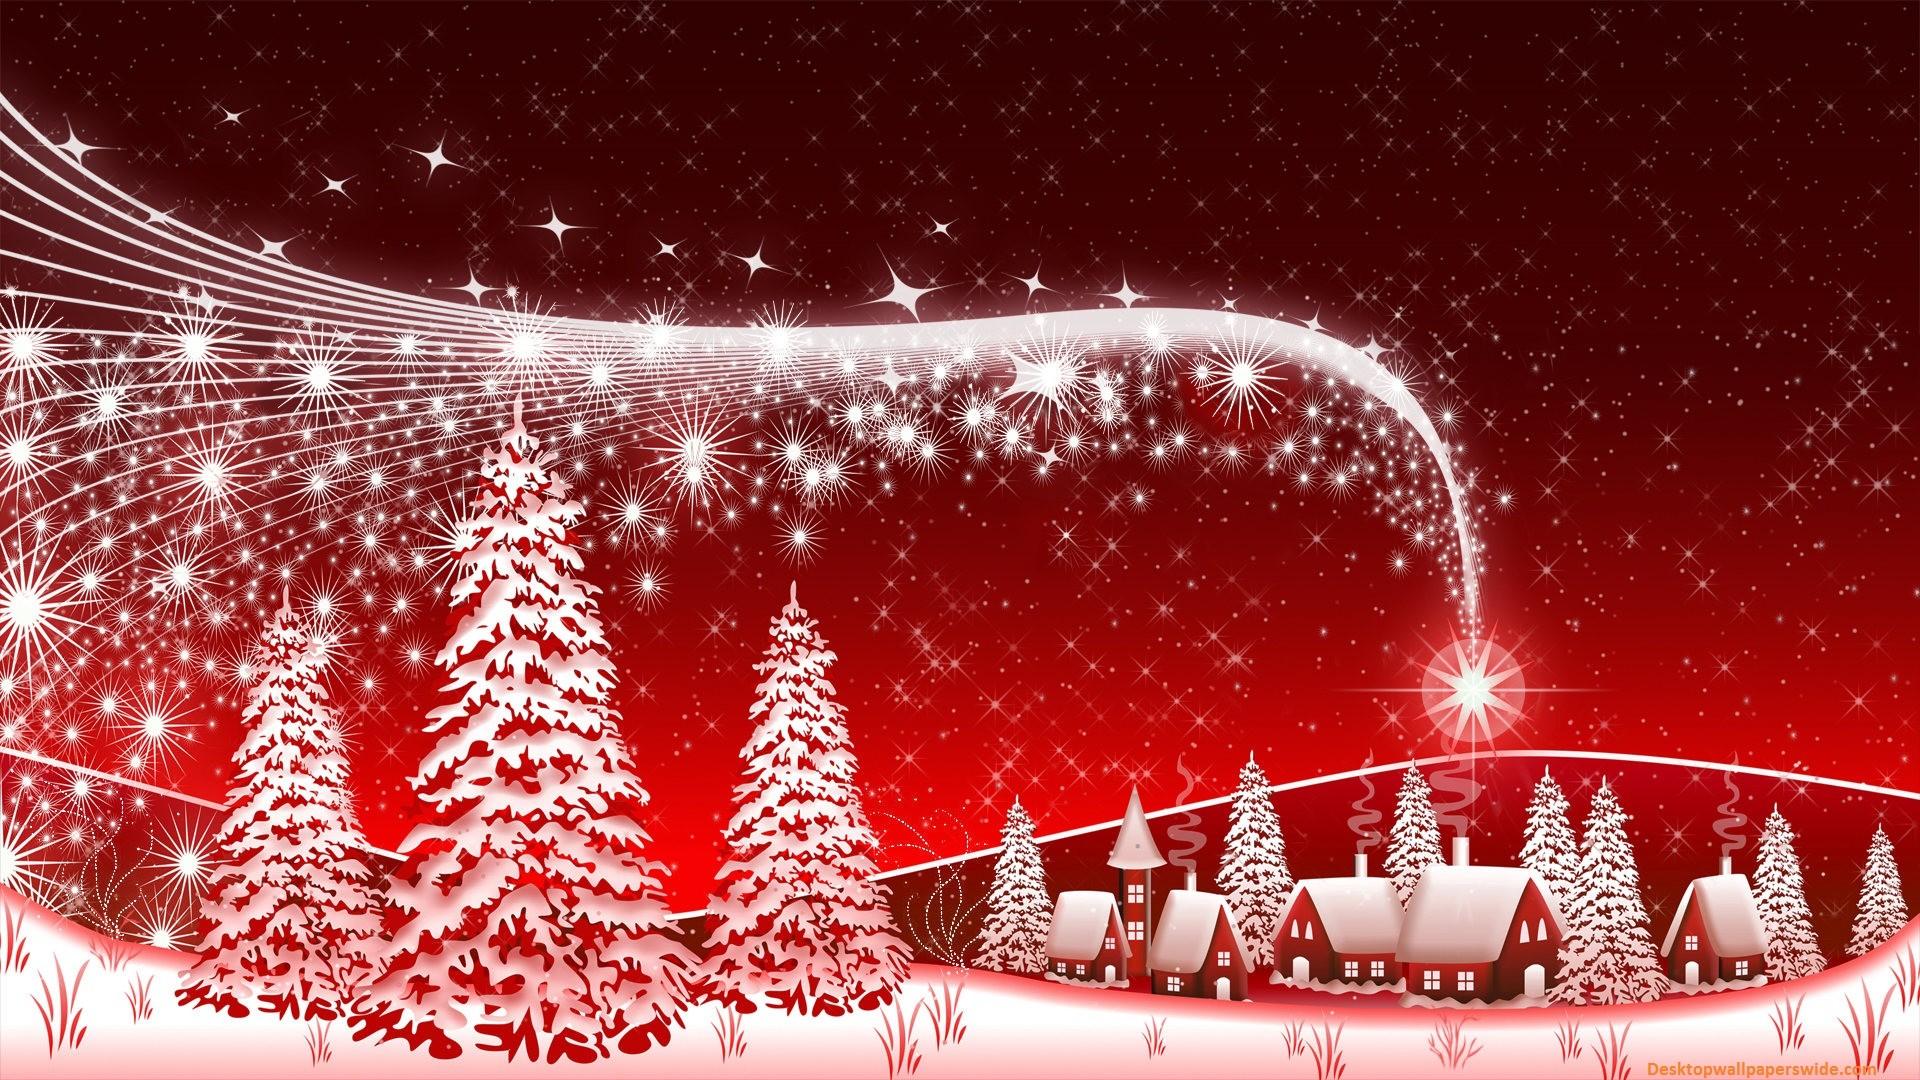 1920x1200 merry christmas wallpaper 15